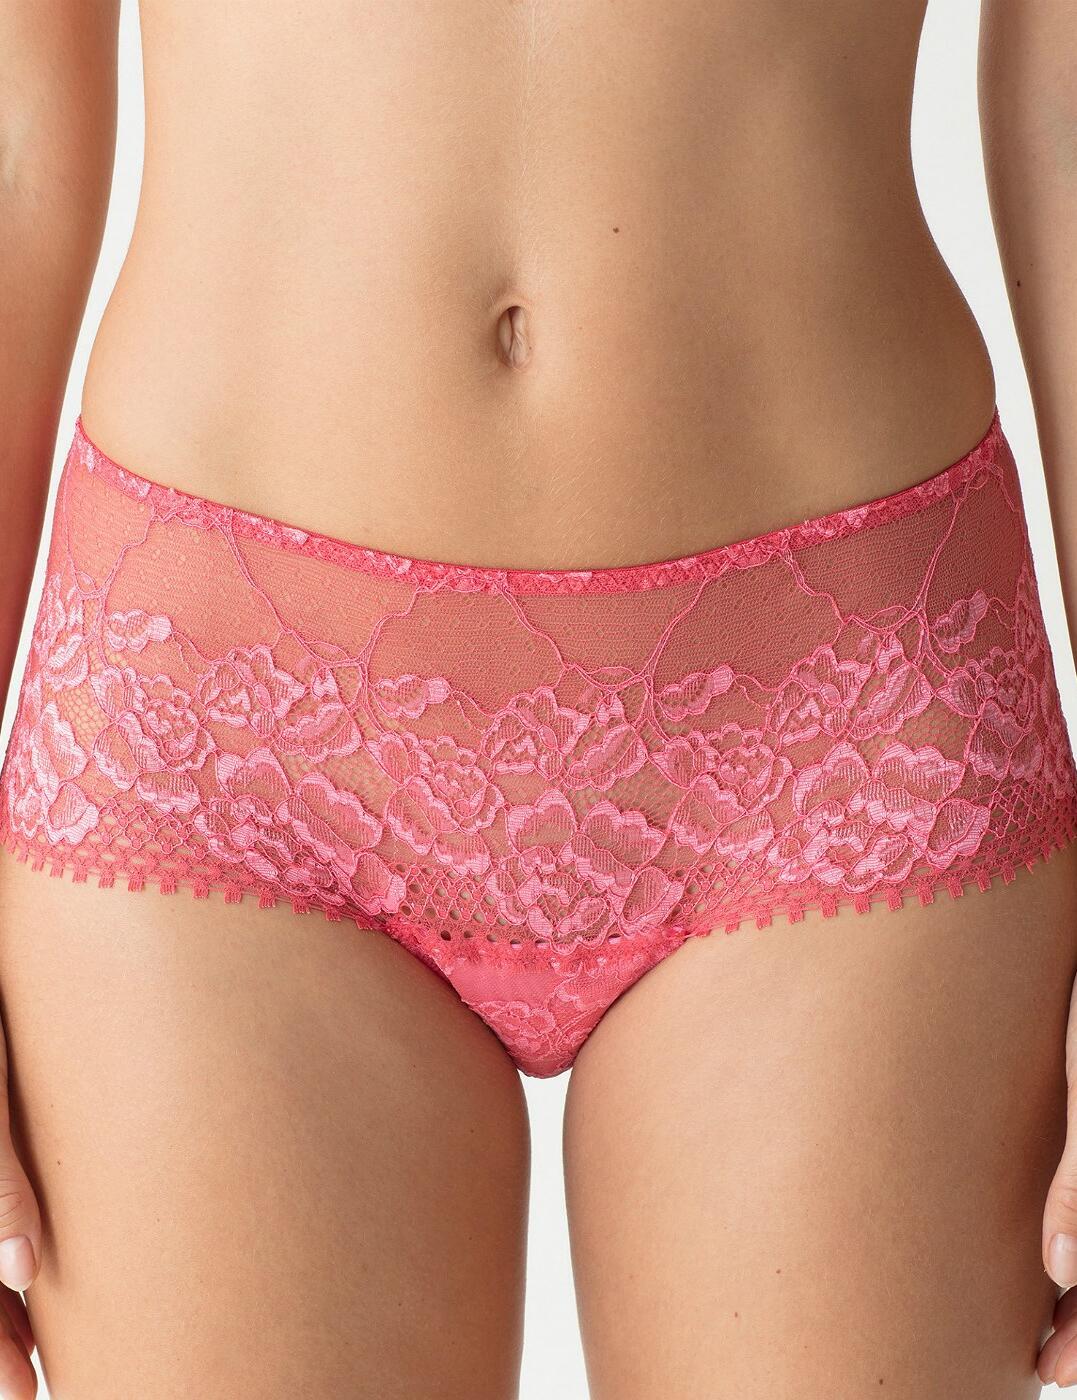 0541722 Prima Donna Twist Wild Rose Hotpants Brief - 0541722 Tagada